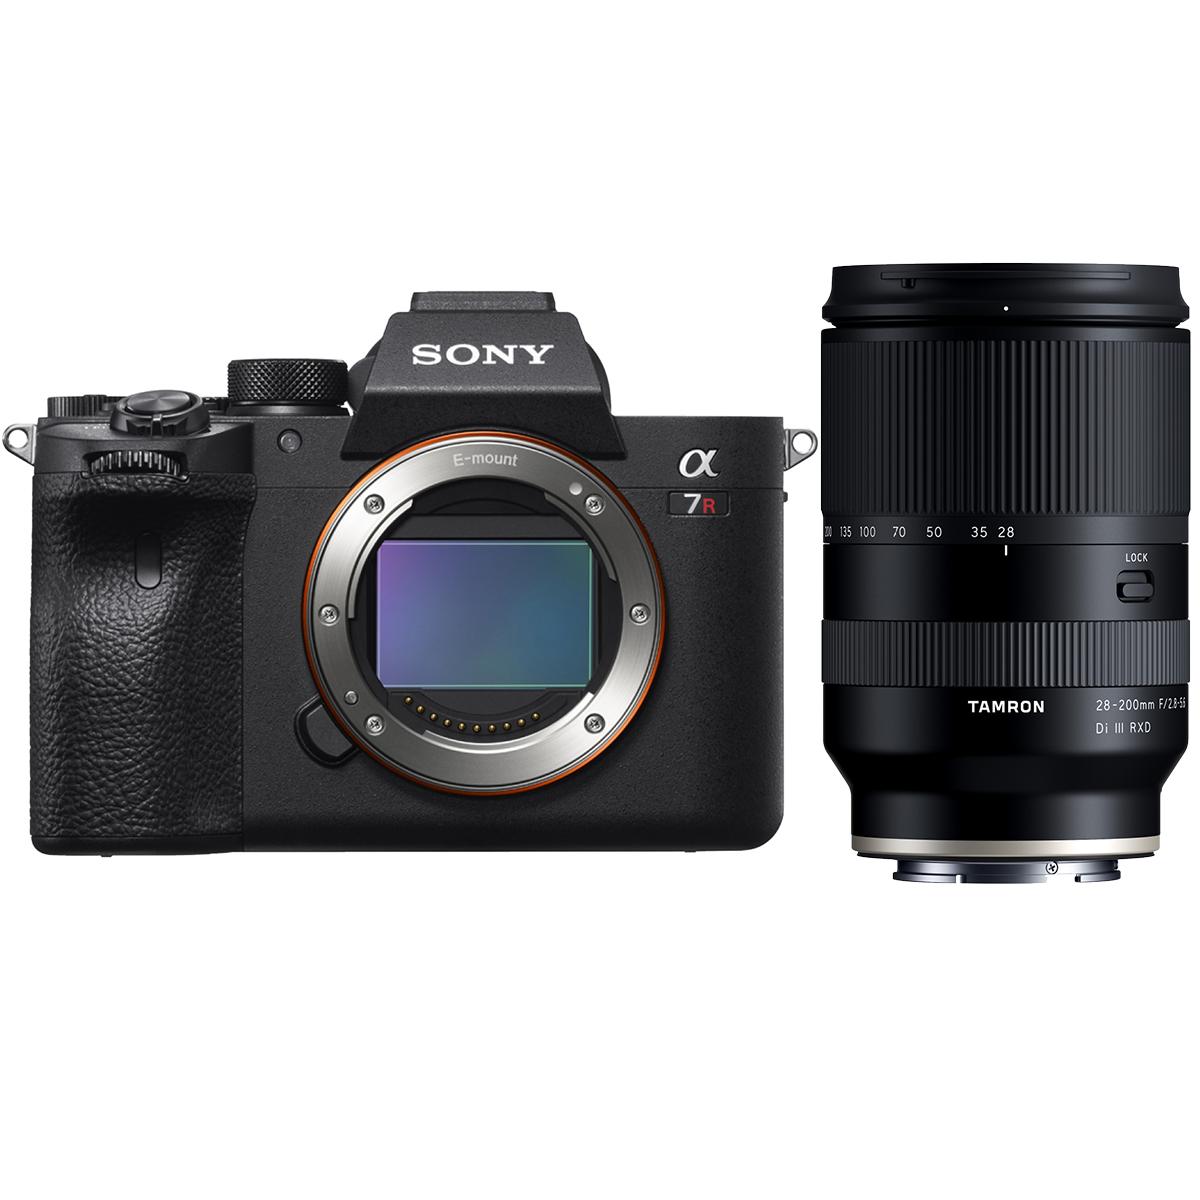 Sony Alpha 7R III + Tamron 28-200mm 1:2,8-5,6 Di III RXD